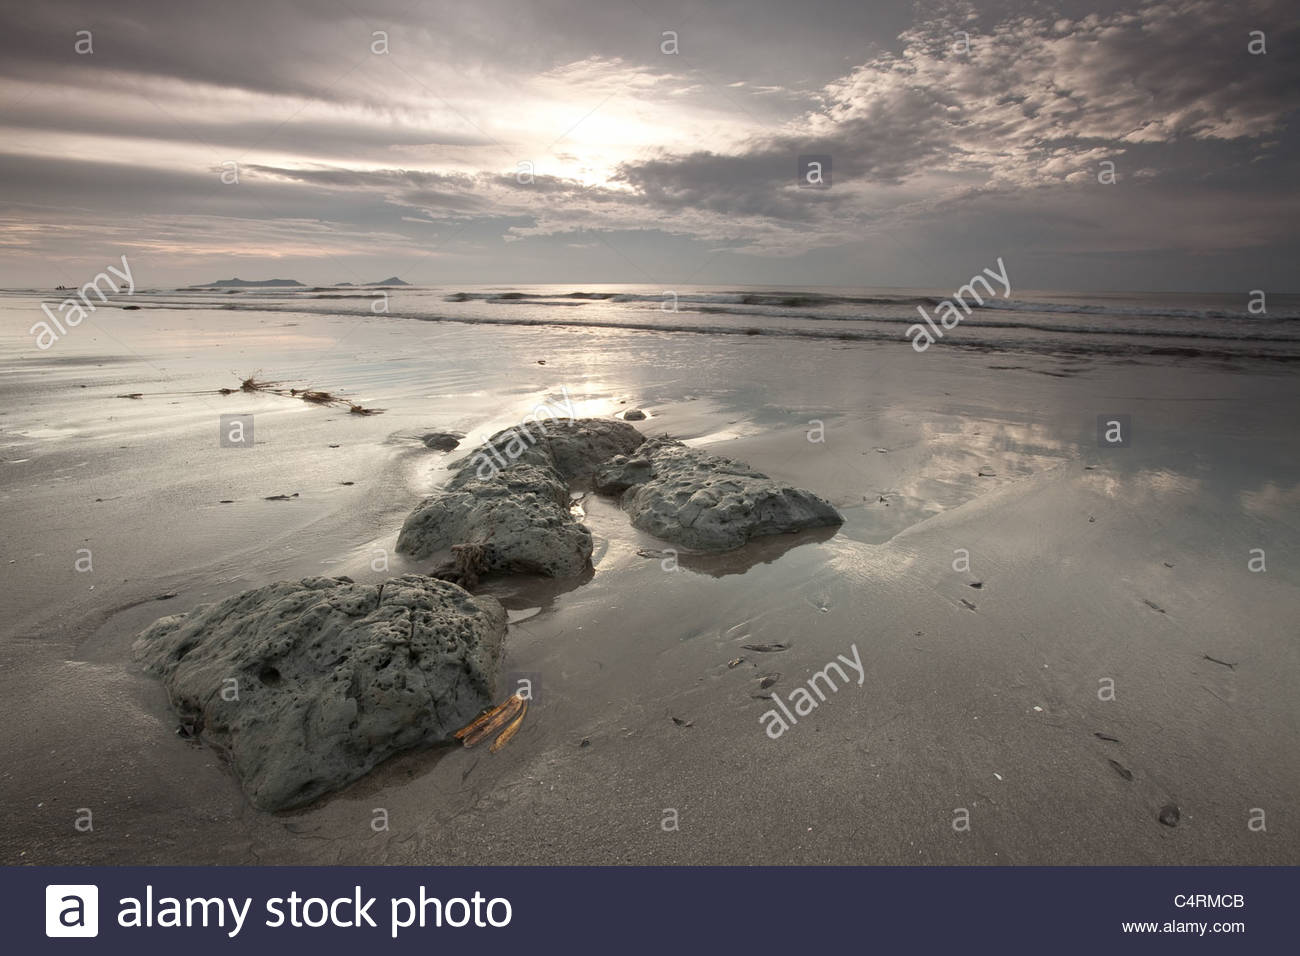 Early morning at Punta Chame, Pacific coast, Panama province, Republic of Panama. - Stock Image